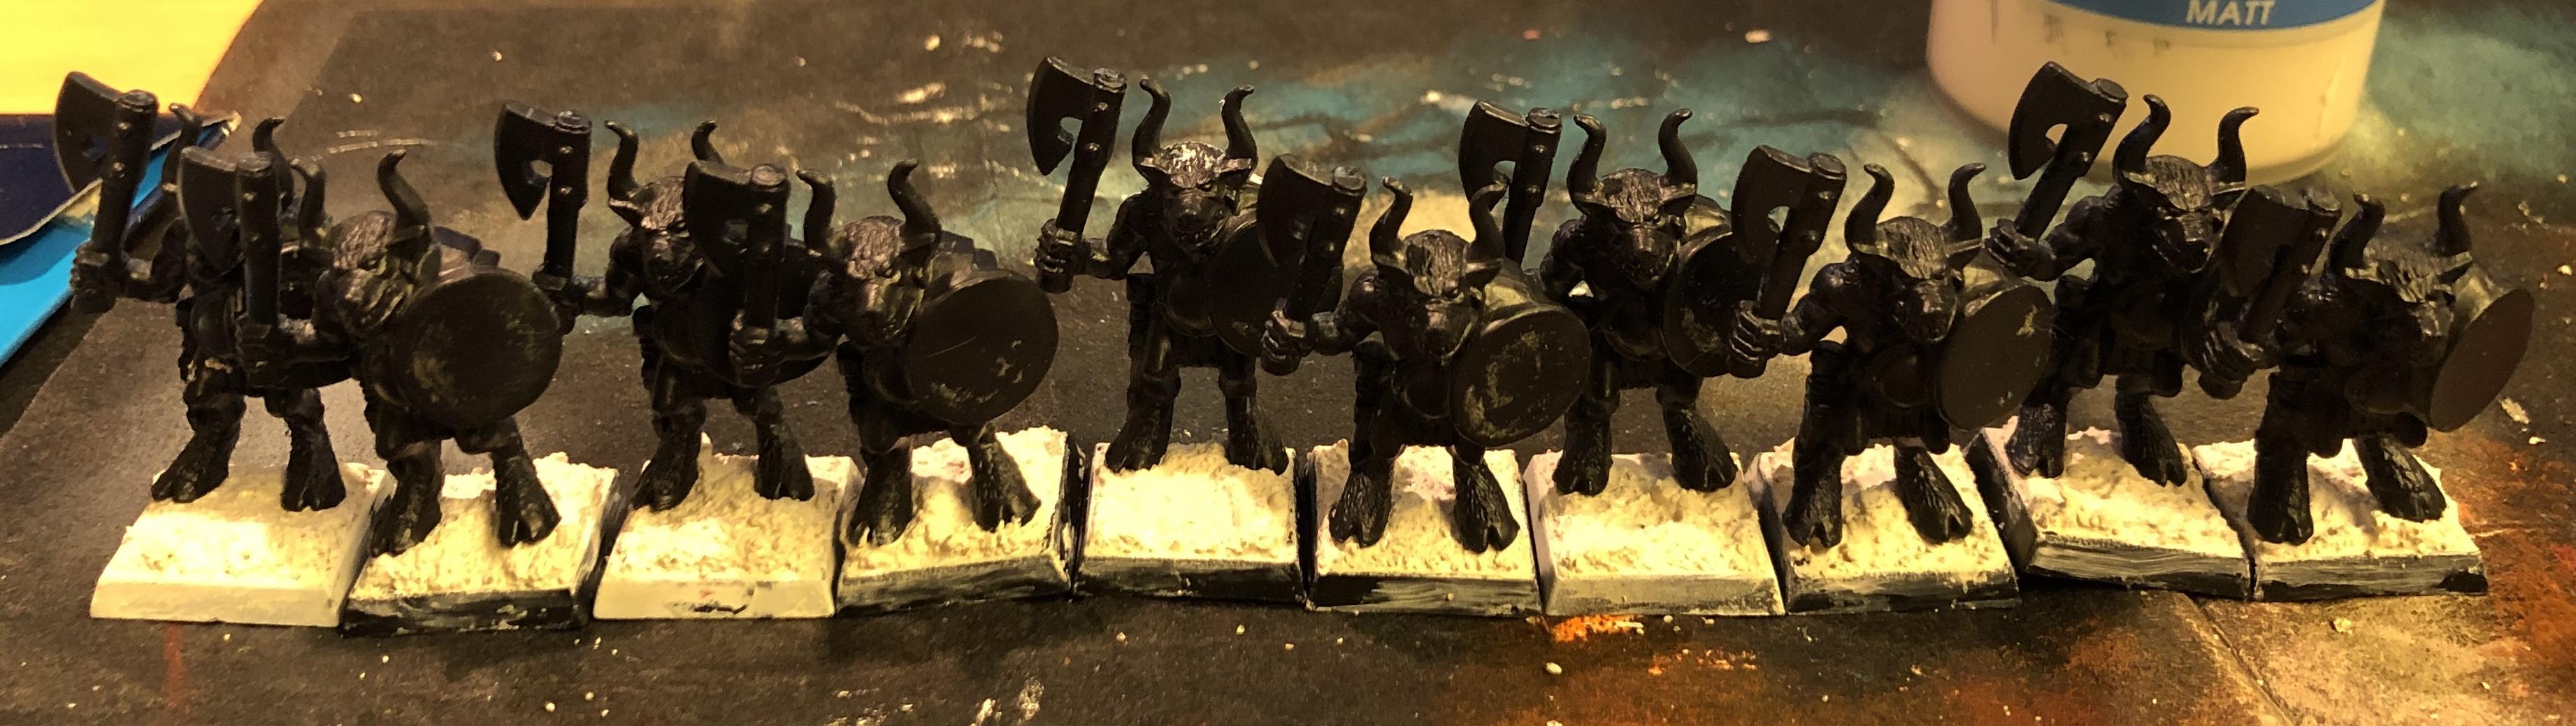 Battle Masters, Beastmen, Chaos